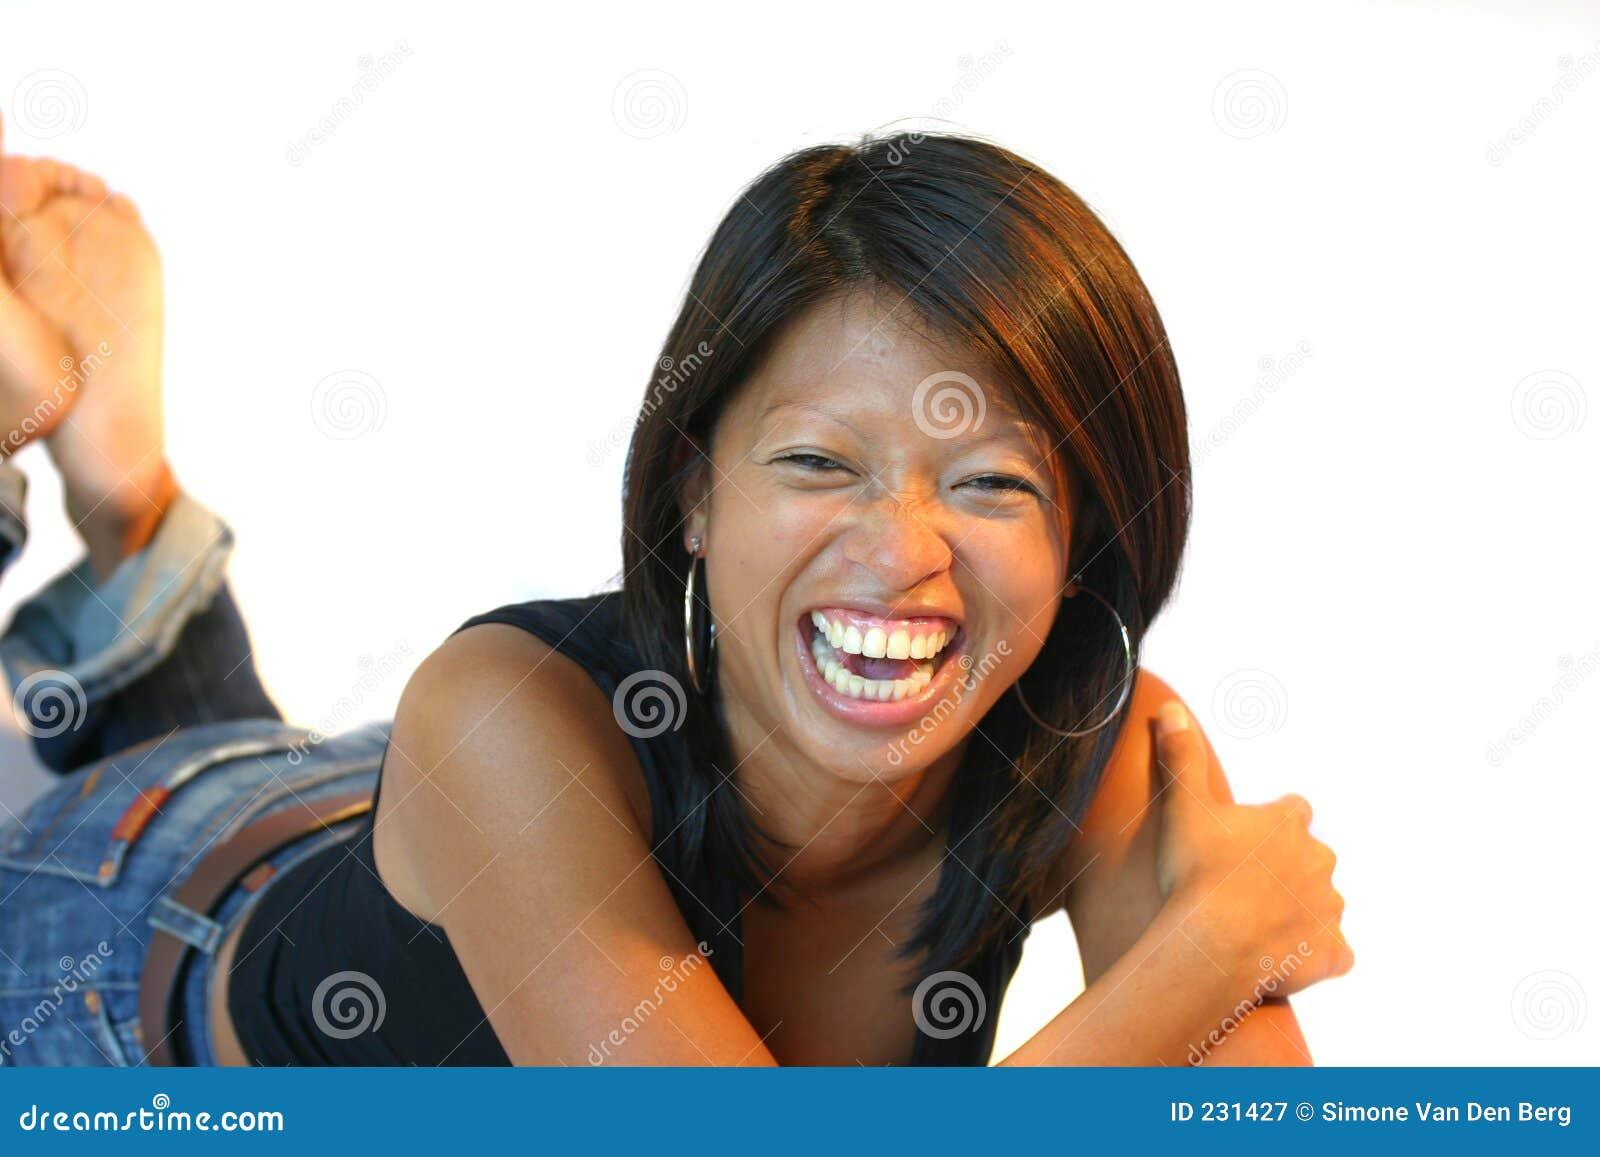 Having a good laugh